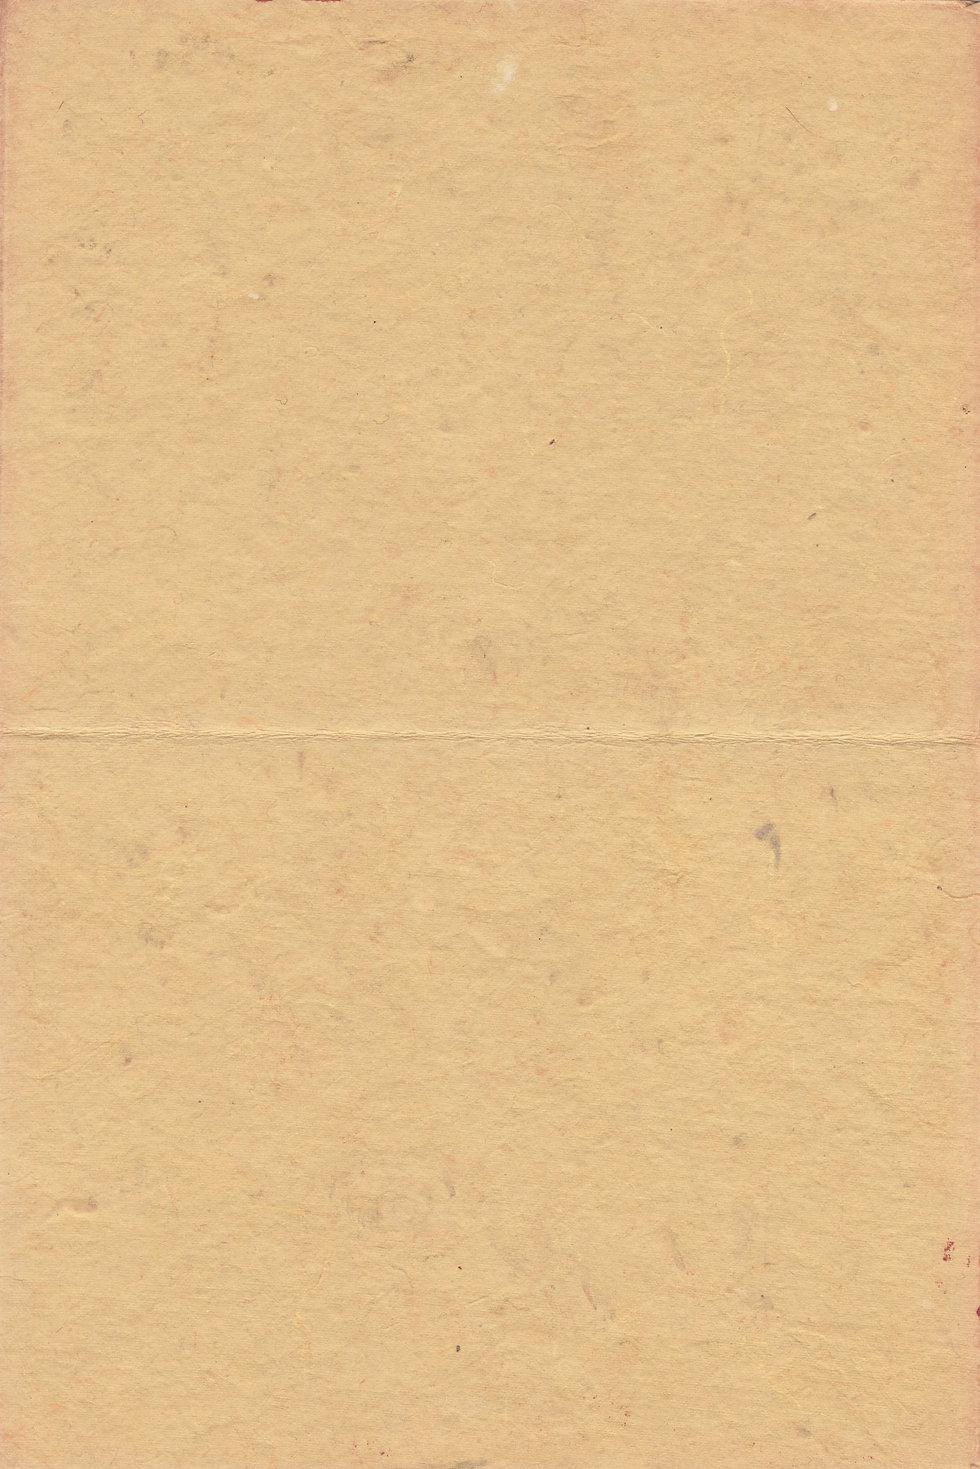 paper_texture_brown_raw_light_brush_book